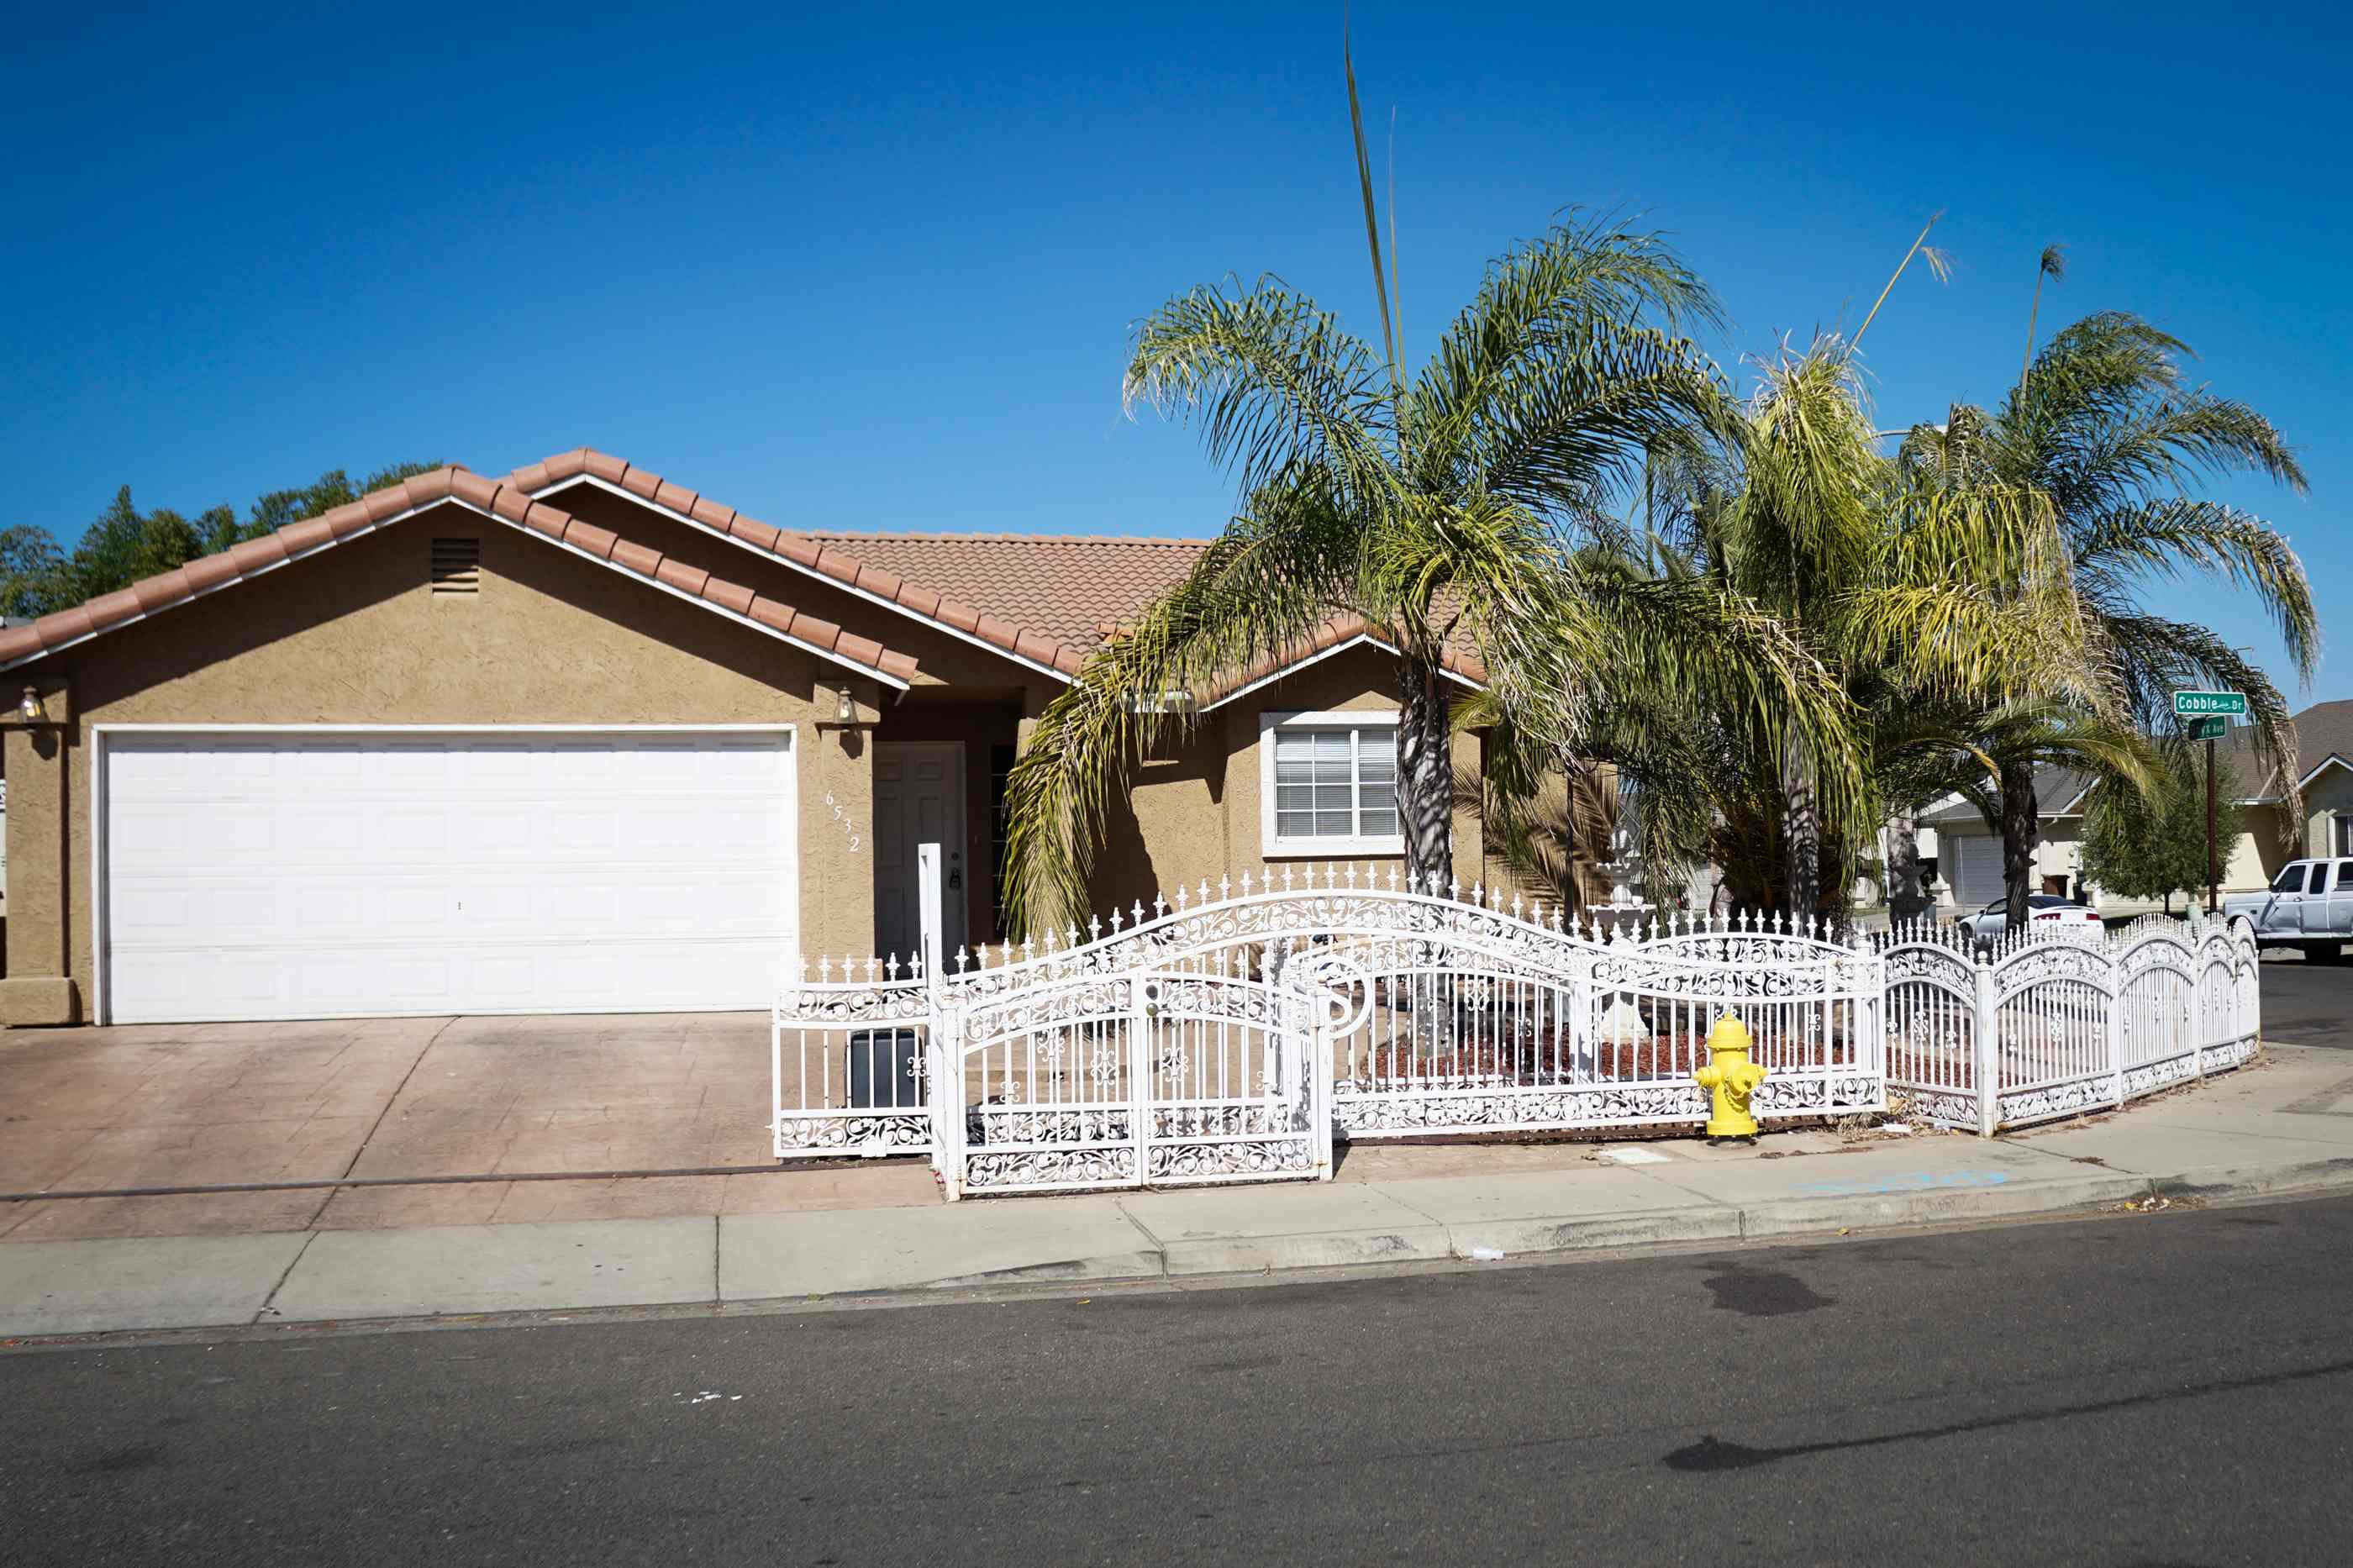 6532 Cobble Dr, Winton, CA 95388